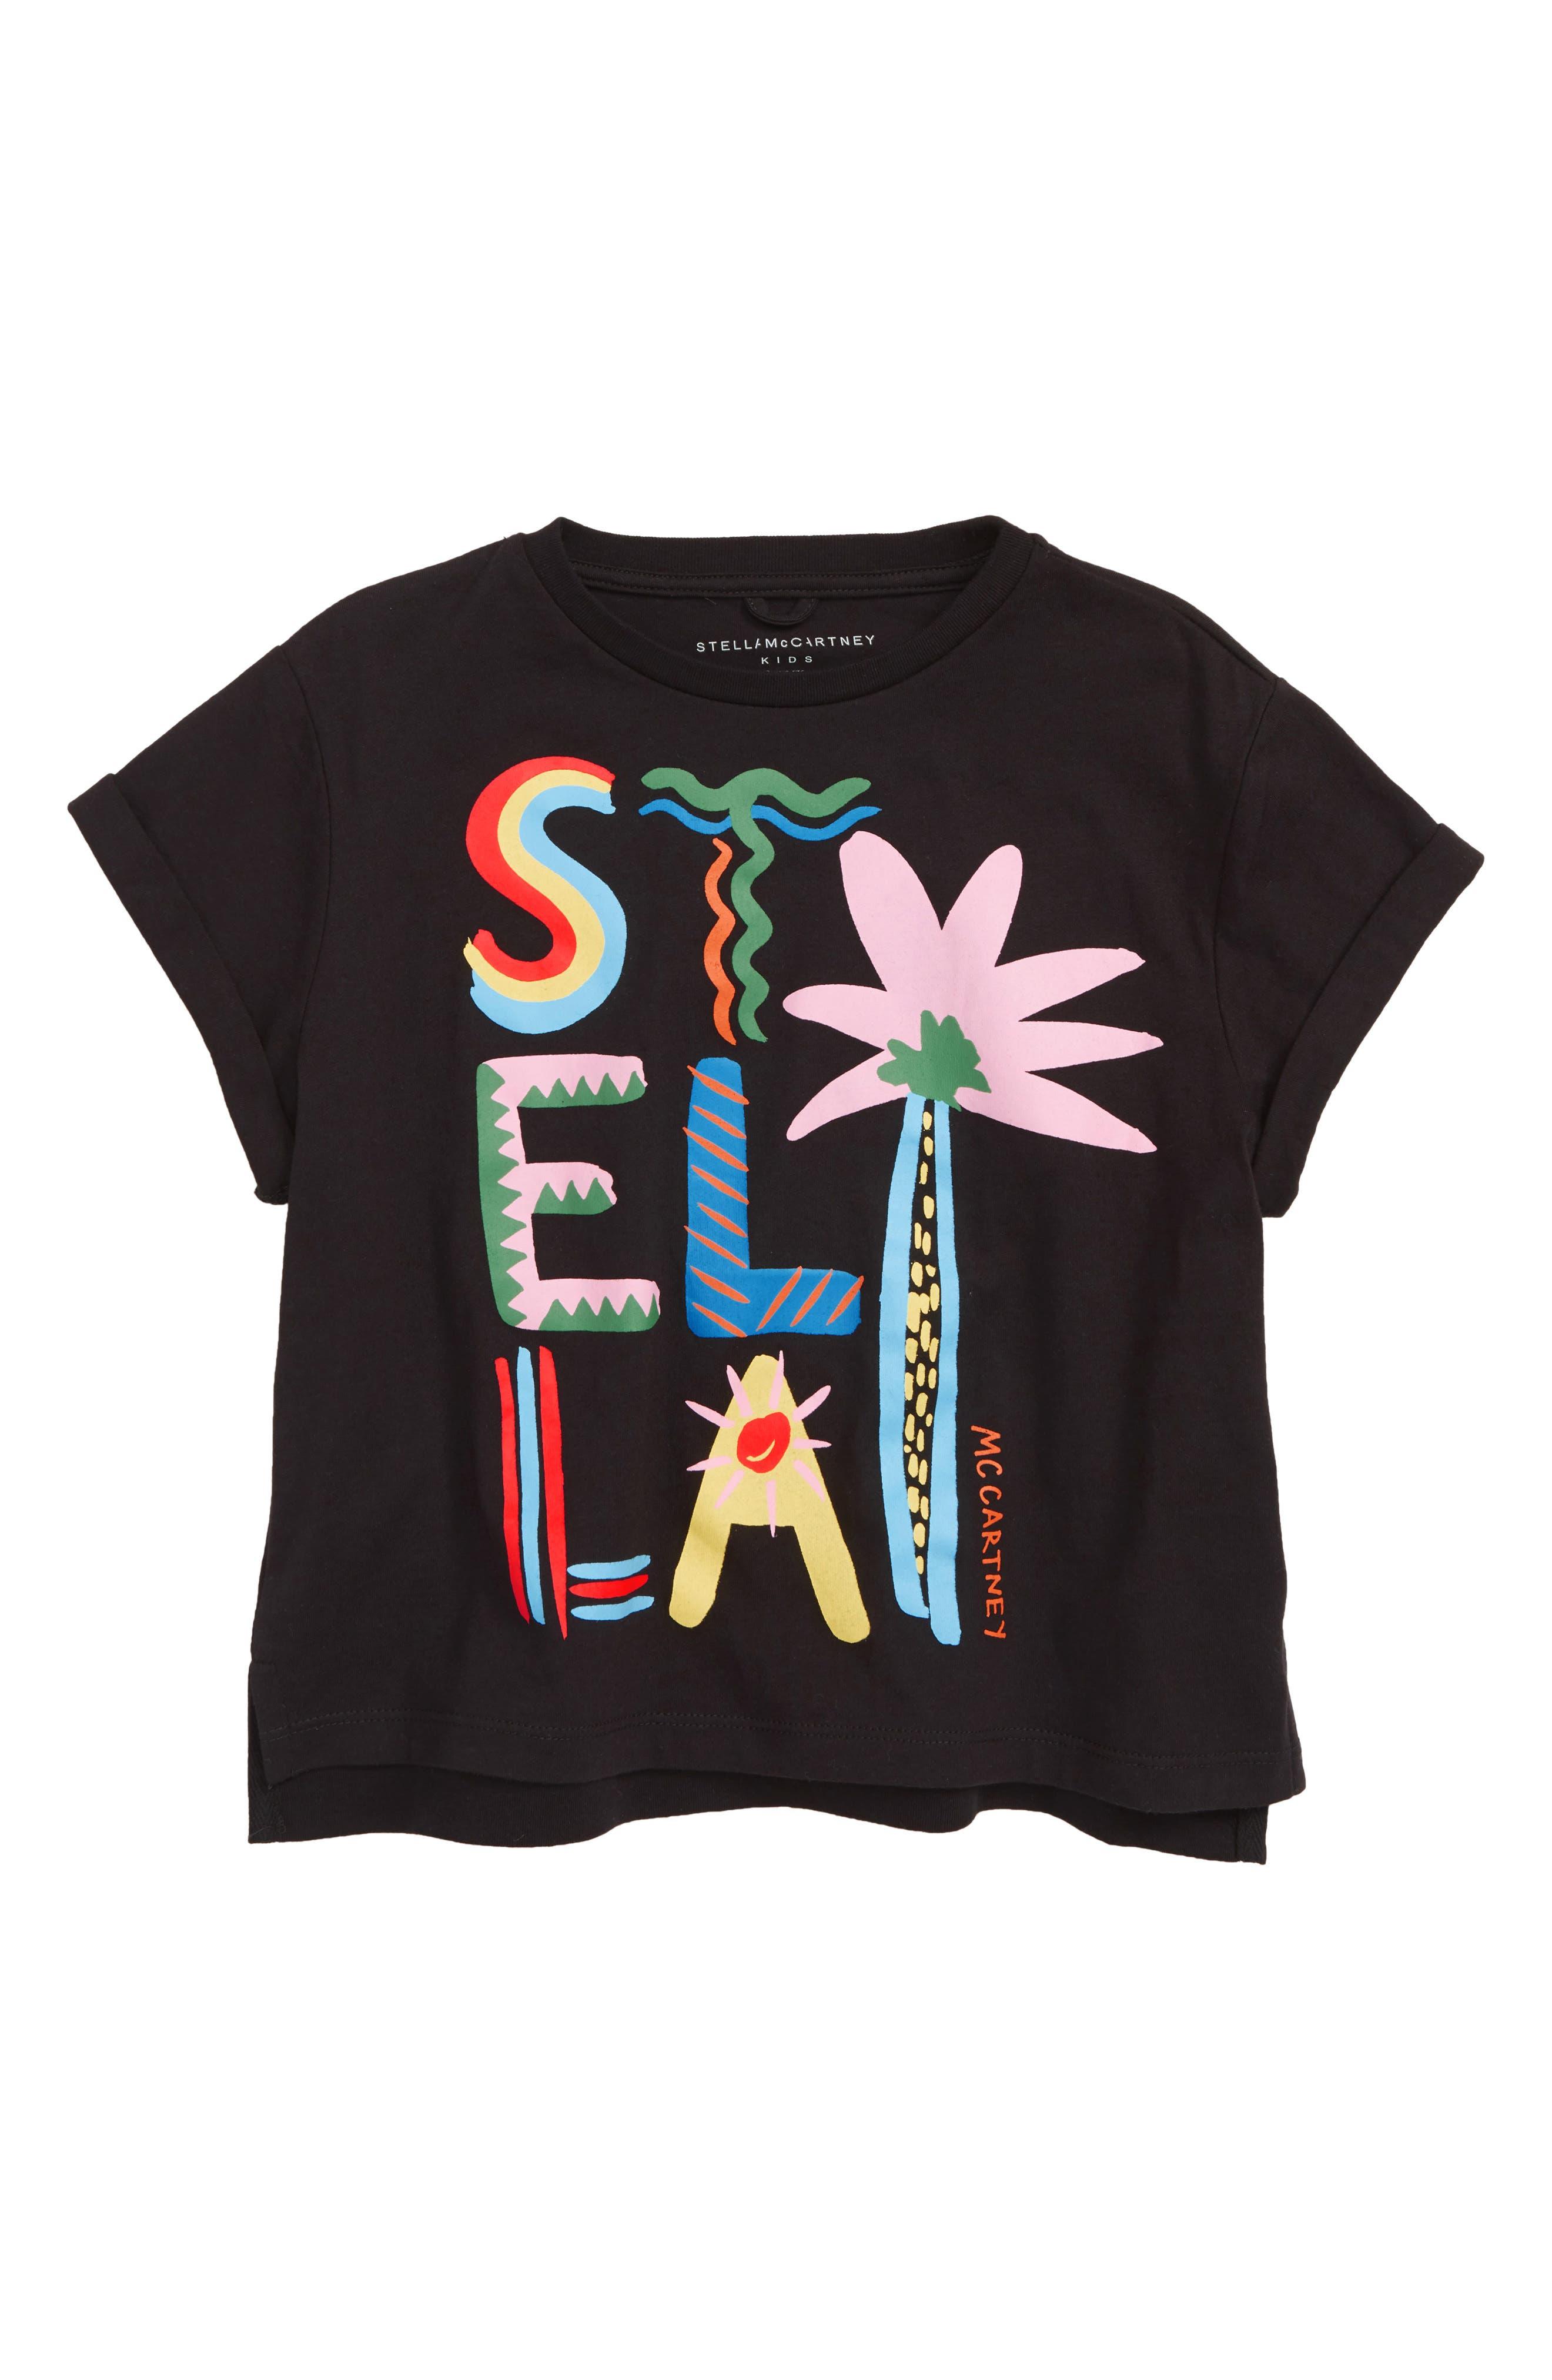 STELLA MCCARTNEY KIDS Logo Print Tee, Main, color, 1073 BLACK